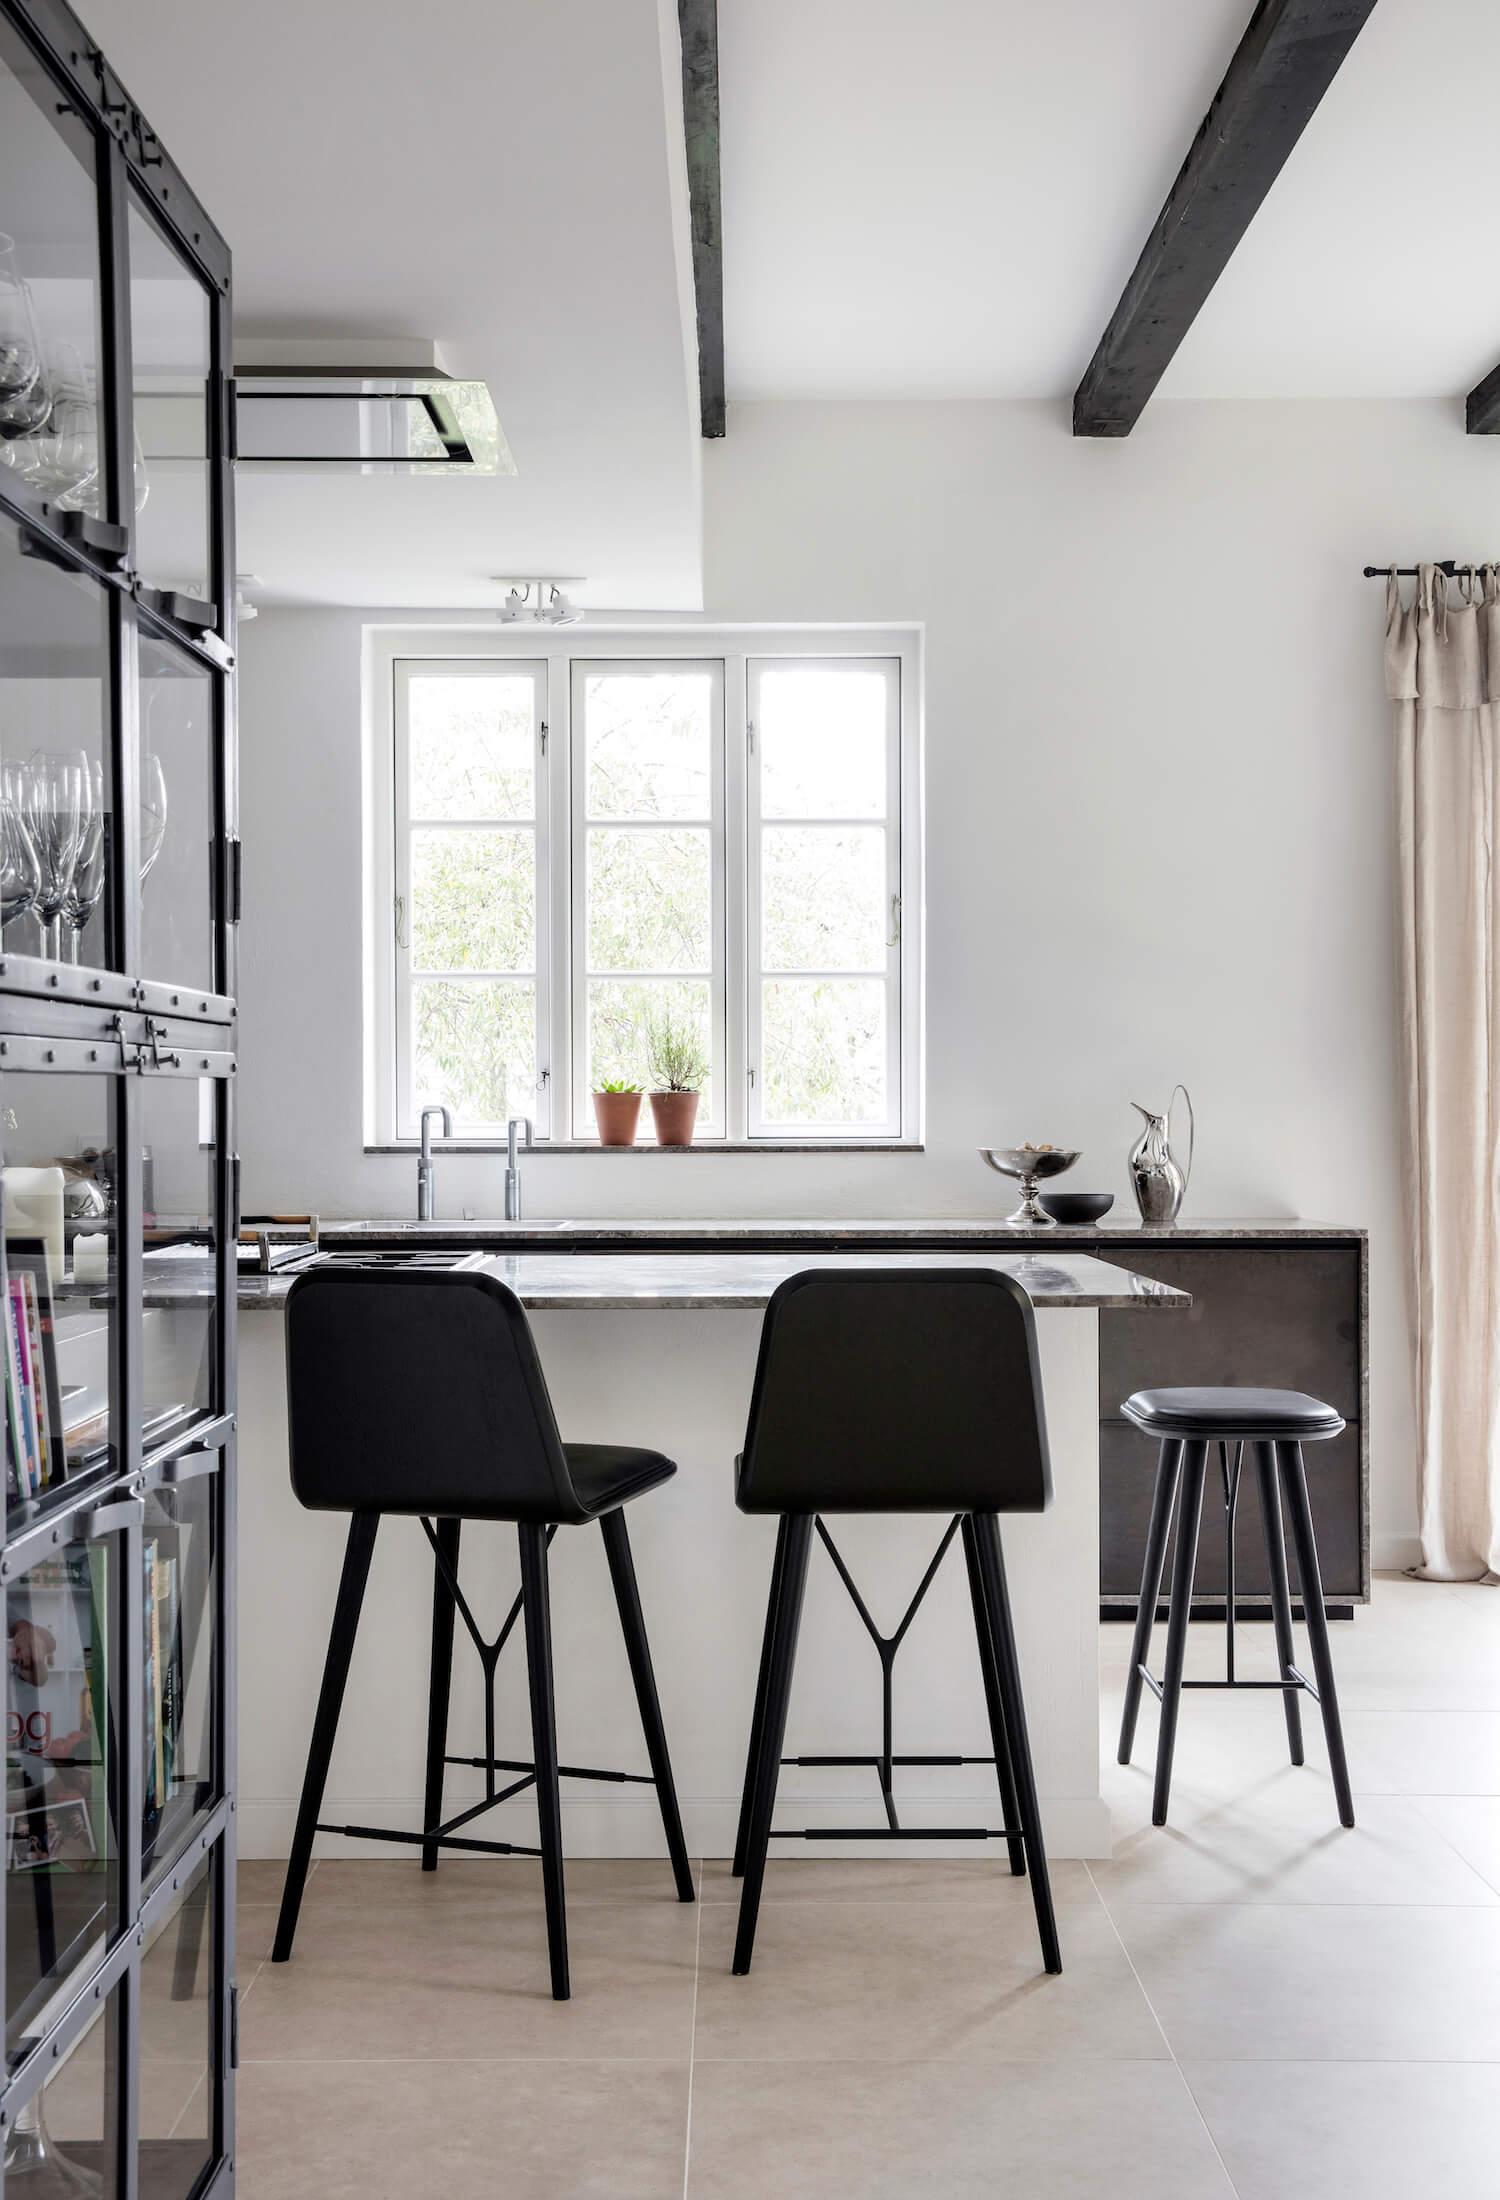 est living global interiors copenhagen home Kitchen6